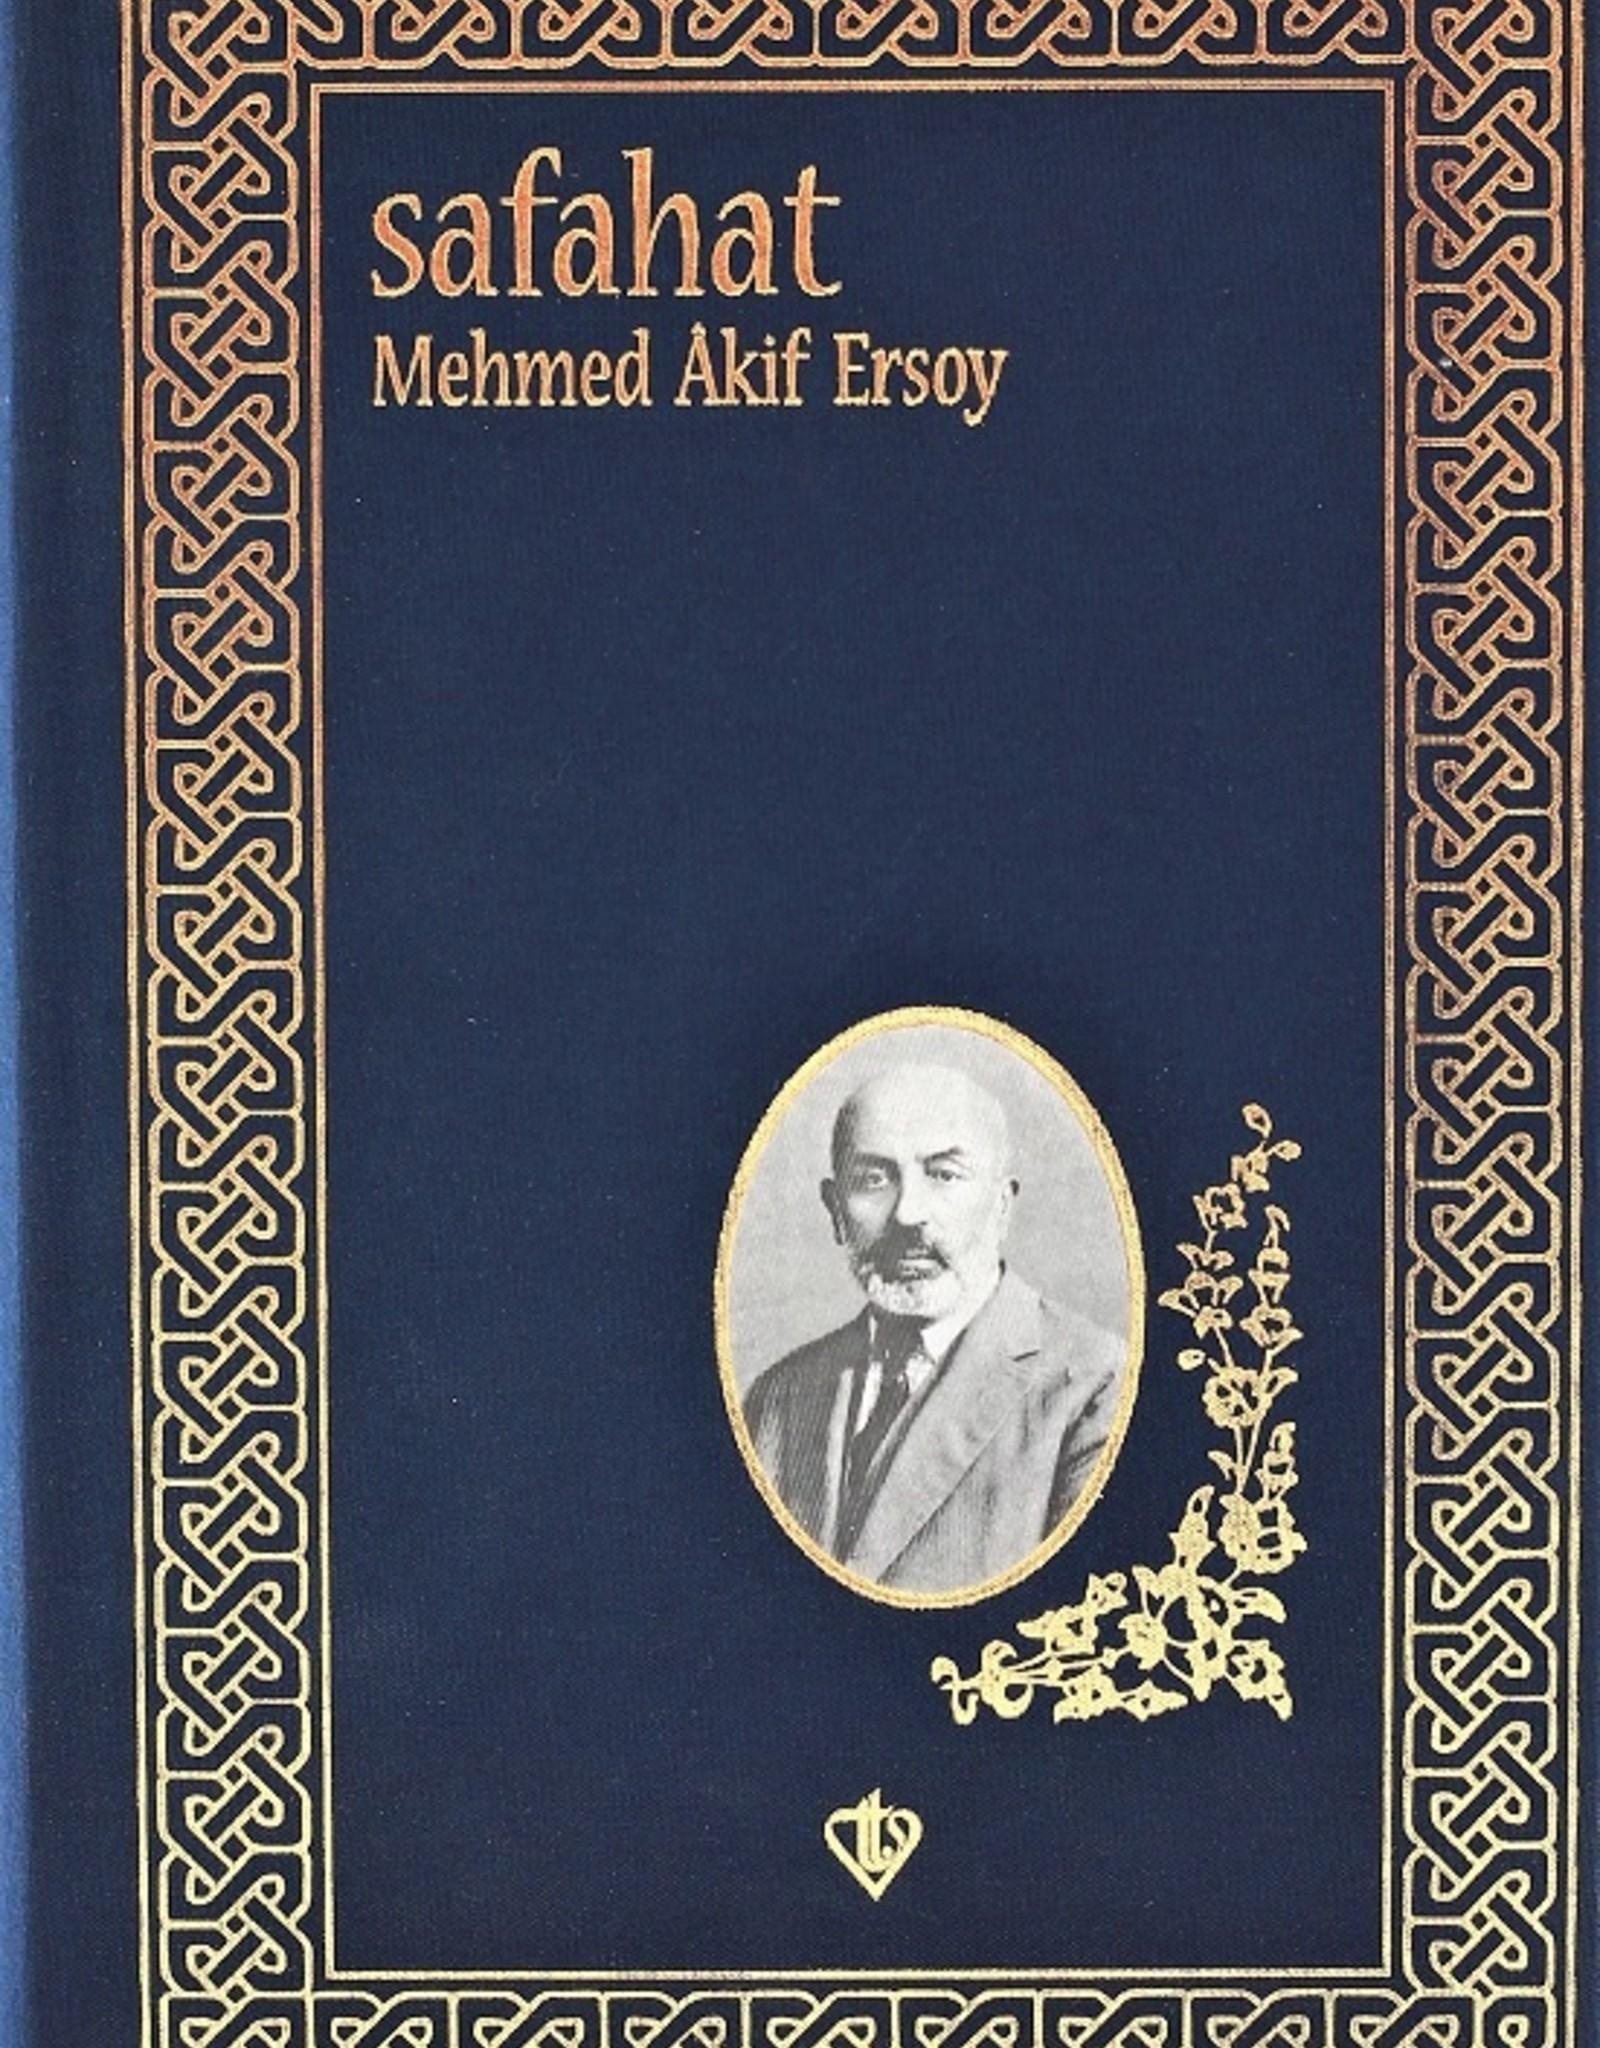 Safahat (bez ciltli)